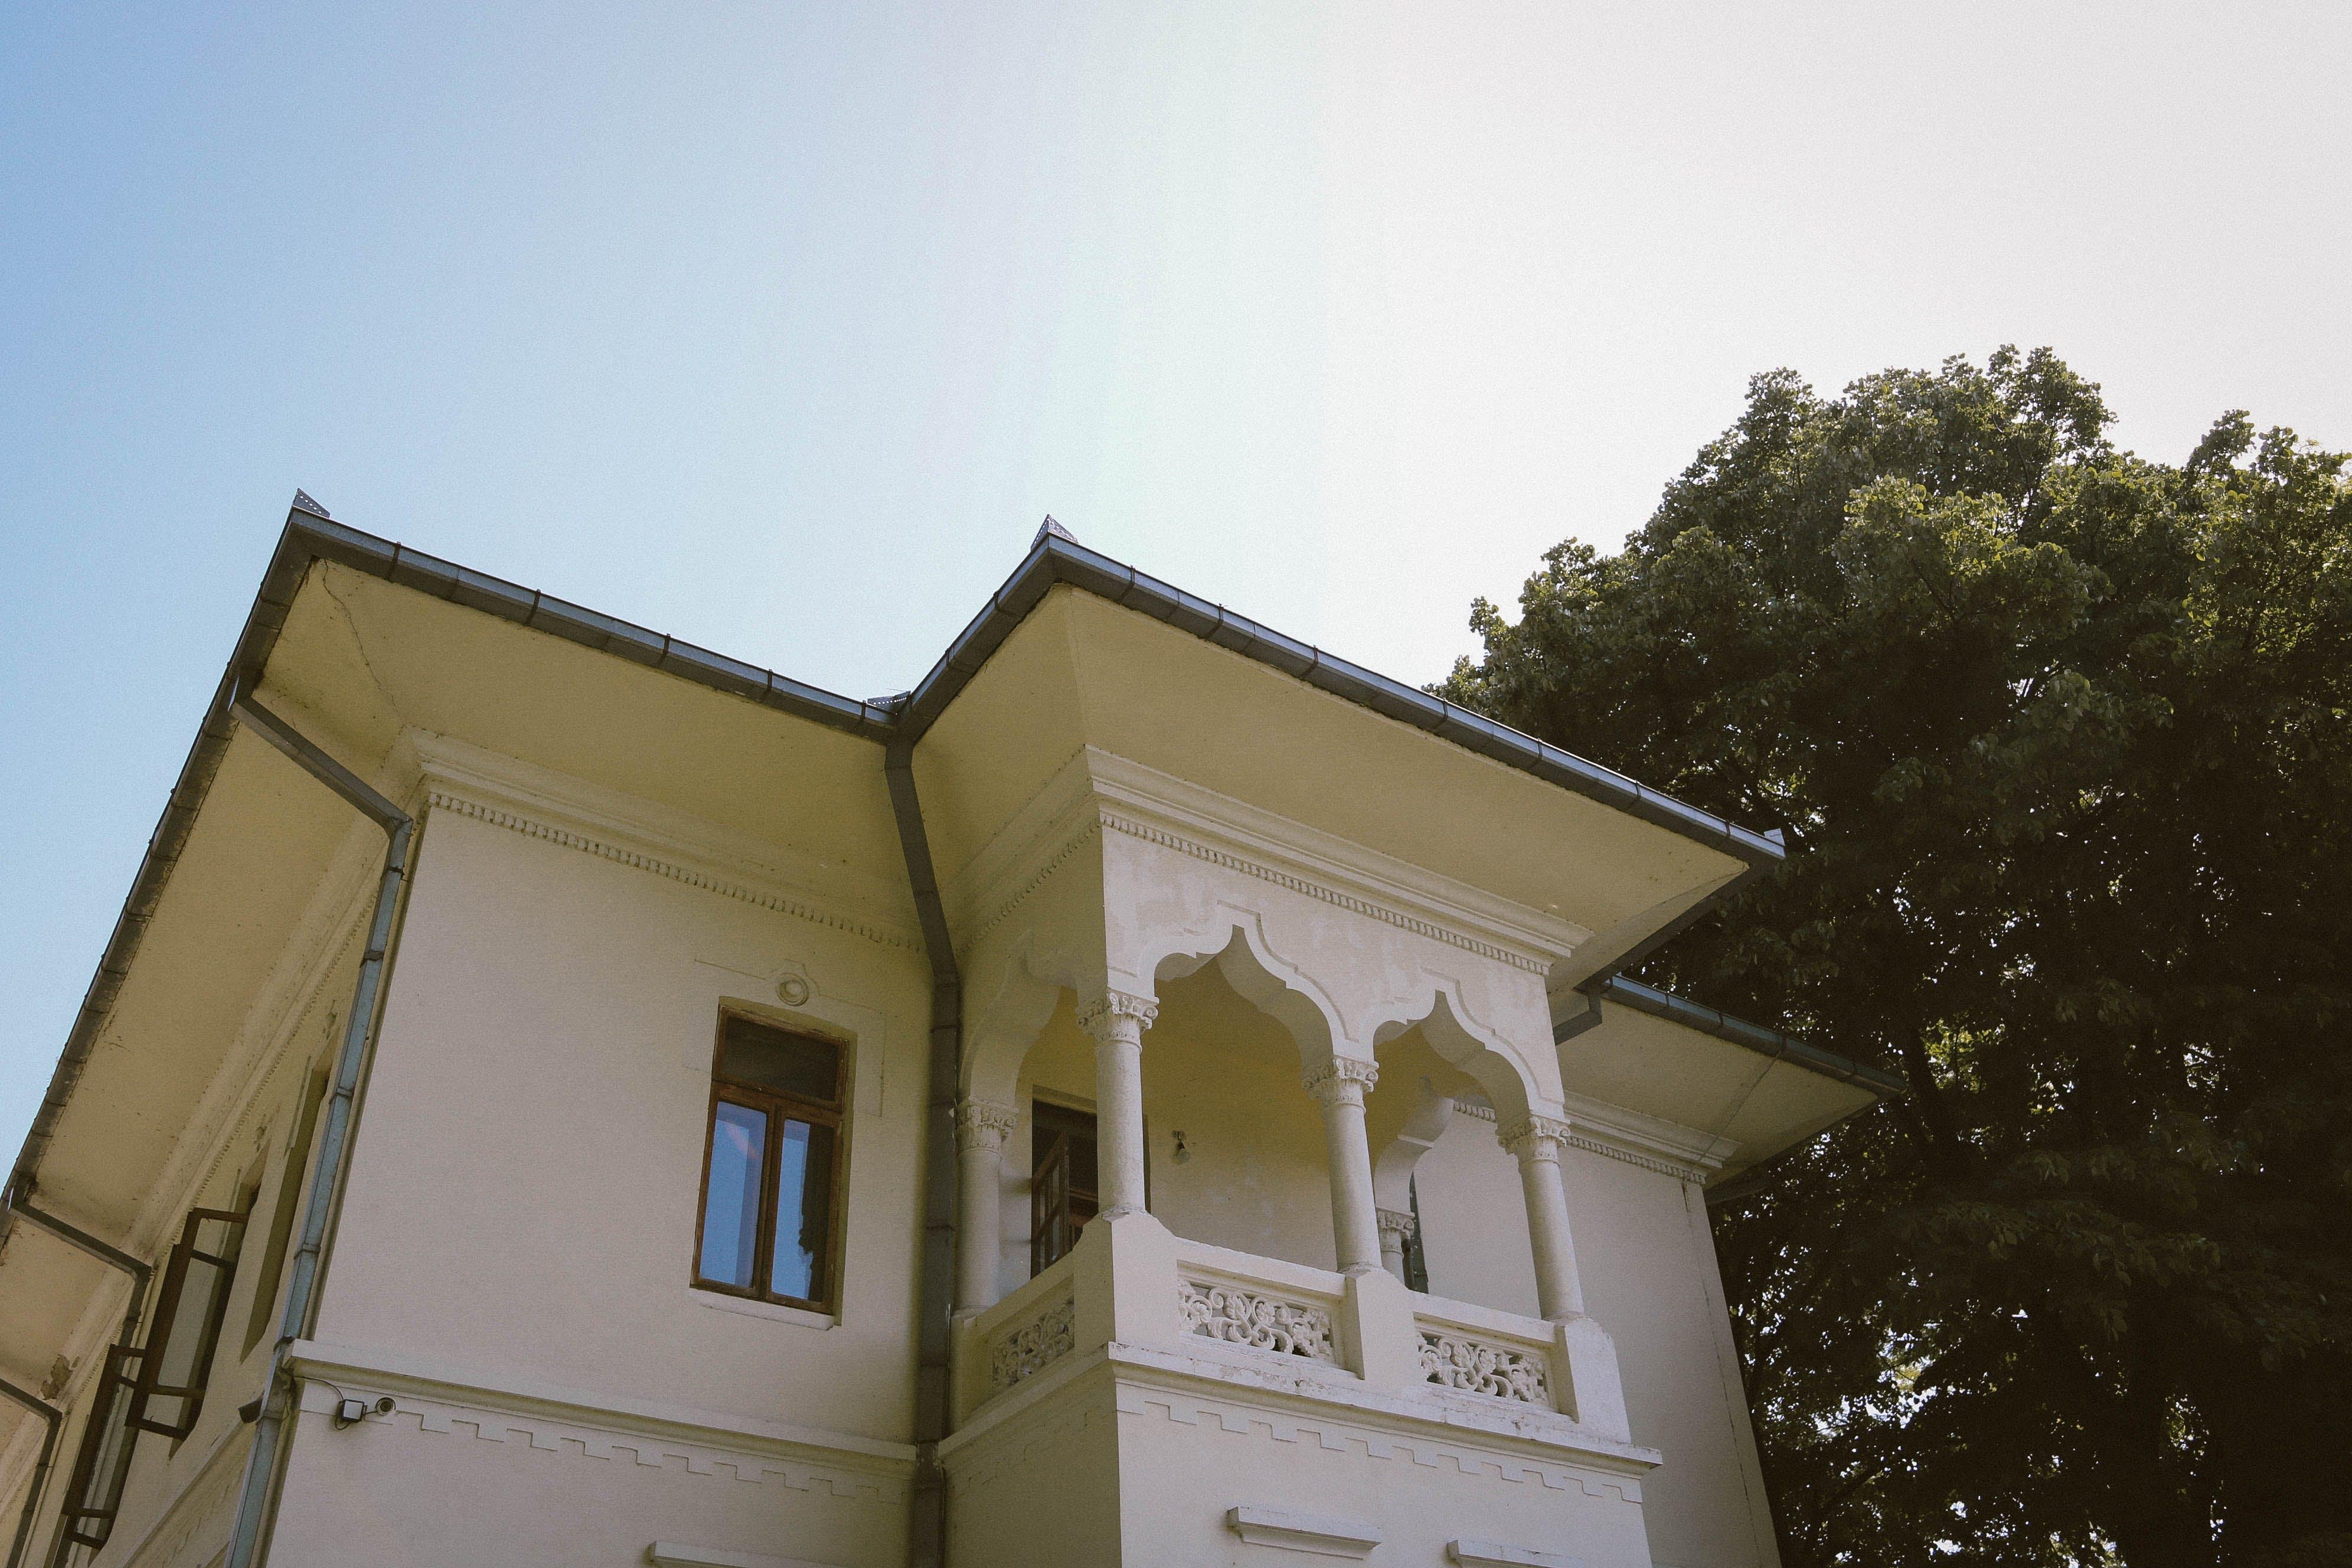 Free stock photo of architecture, balcony, blue sky, eaves